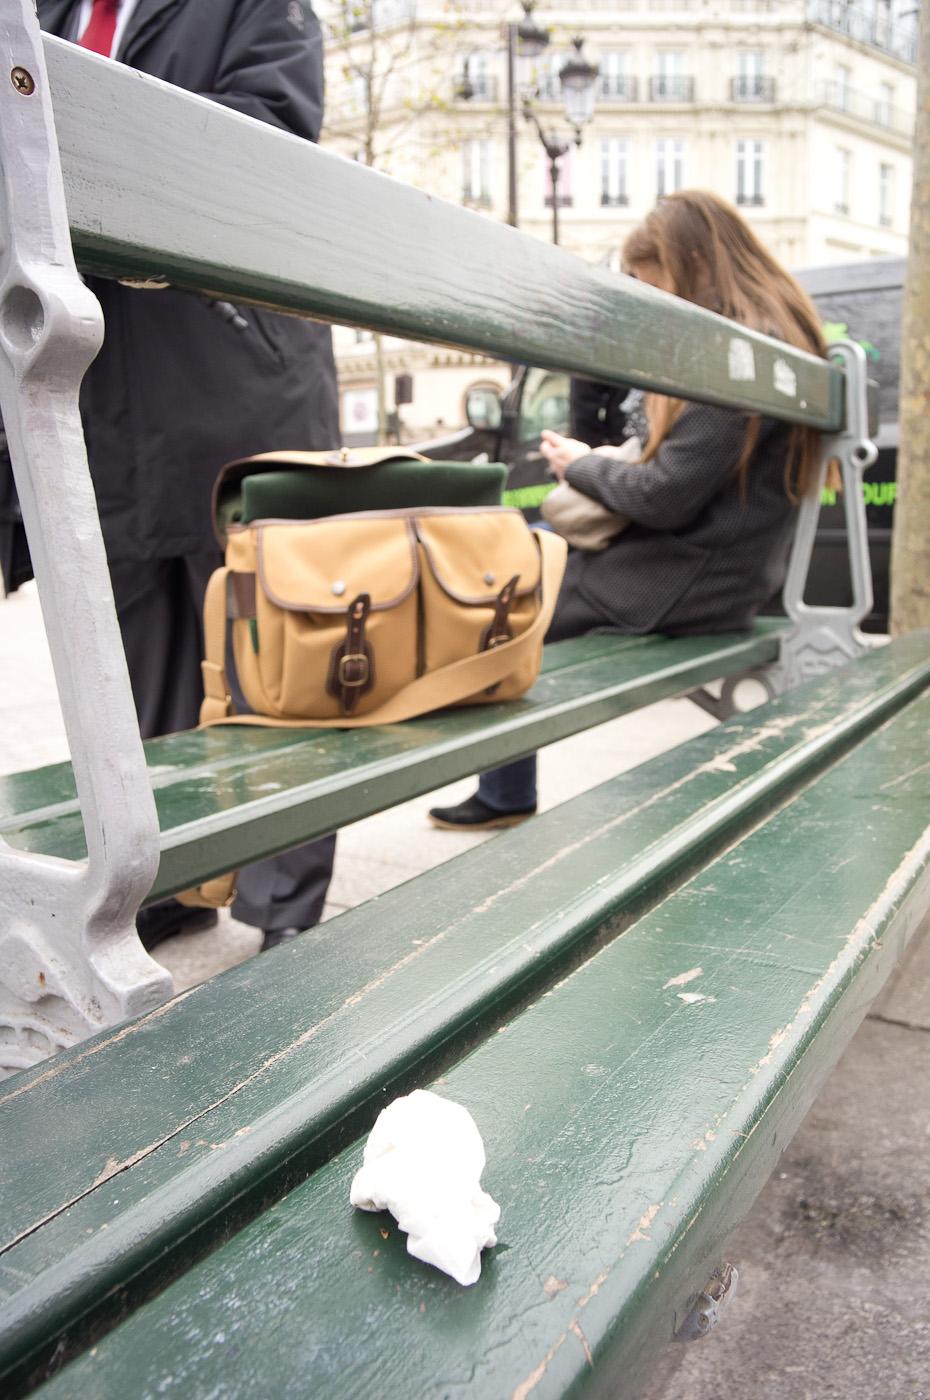 An abandonned handkerchief on a Paris bench, sony NEX-5N & Zeiss ZM Distagon 18mm/4